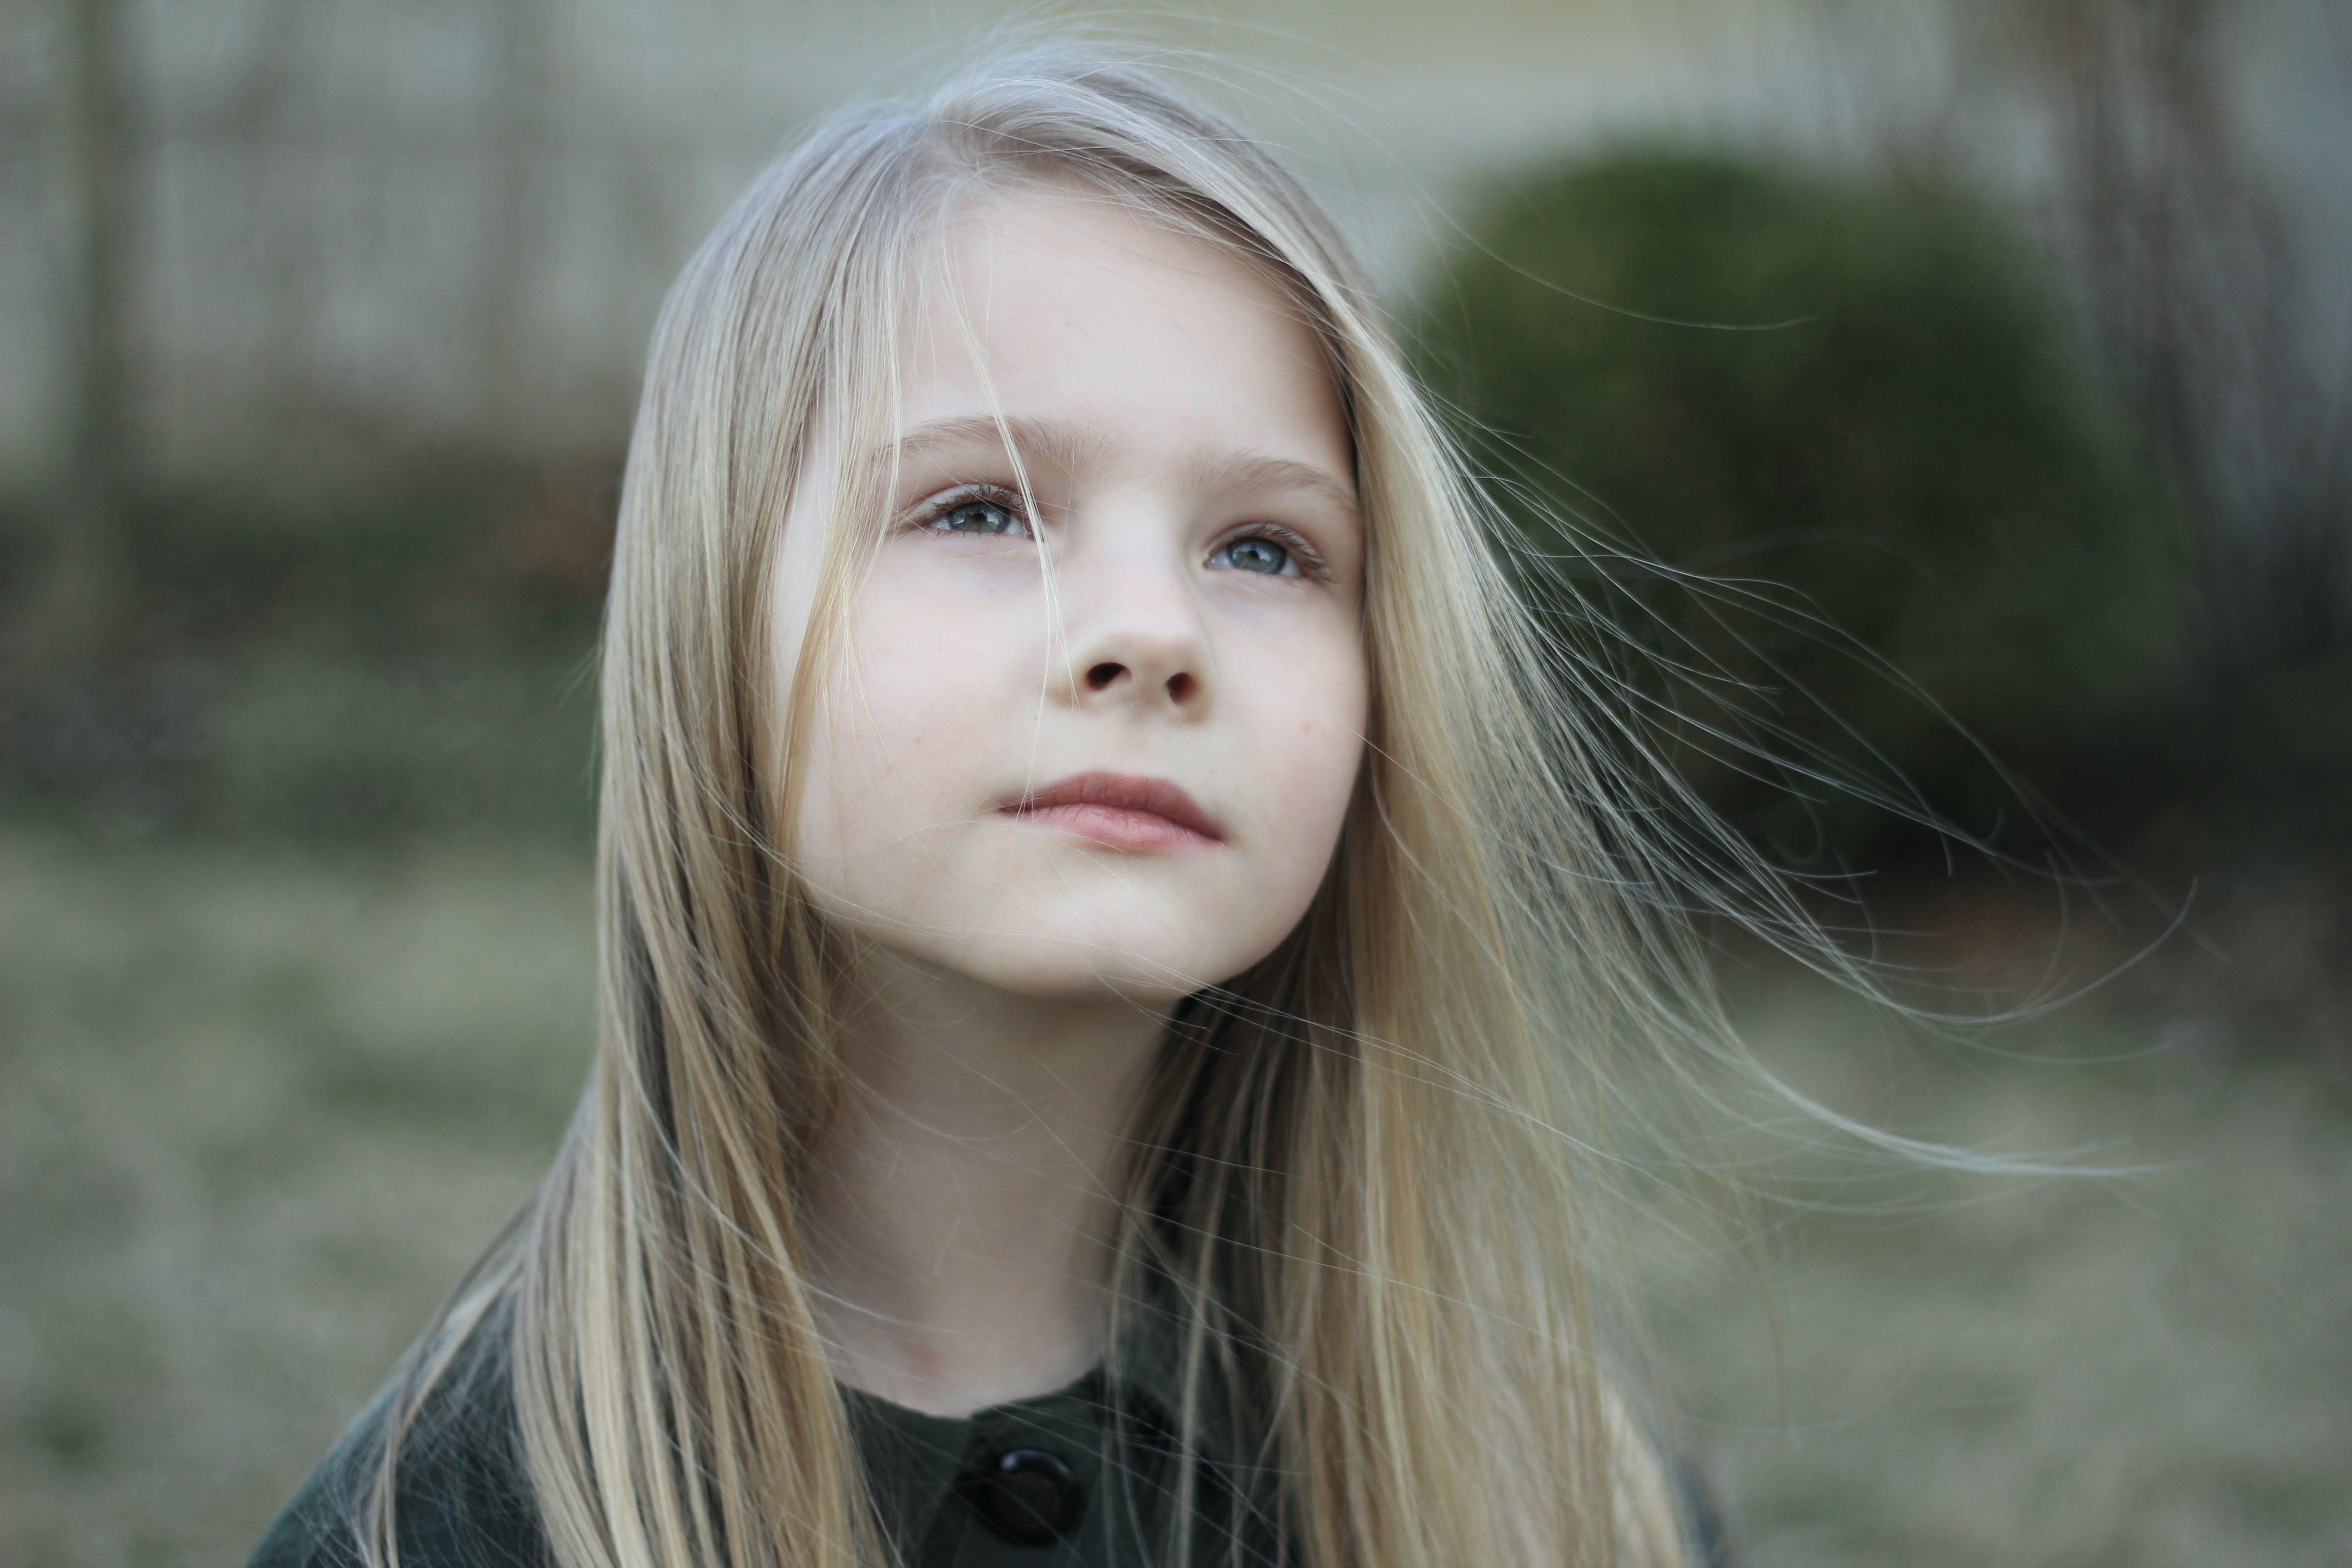 beautiful, blondegirl, blondehair